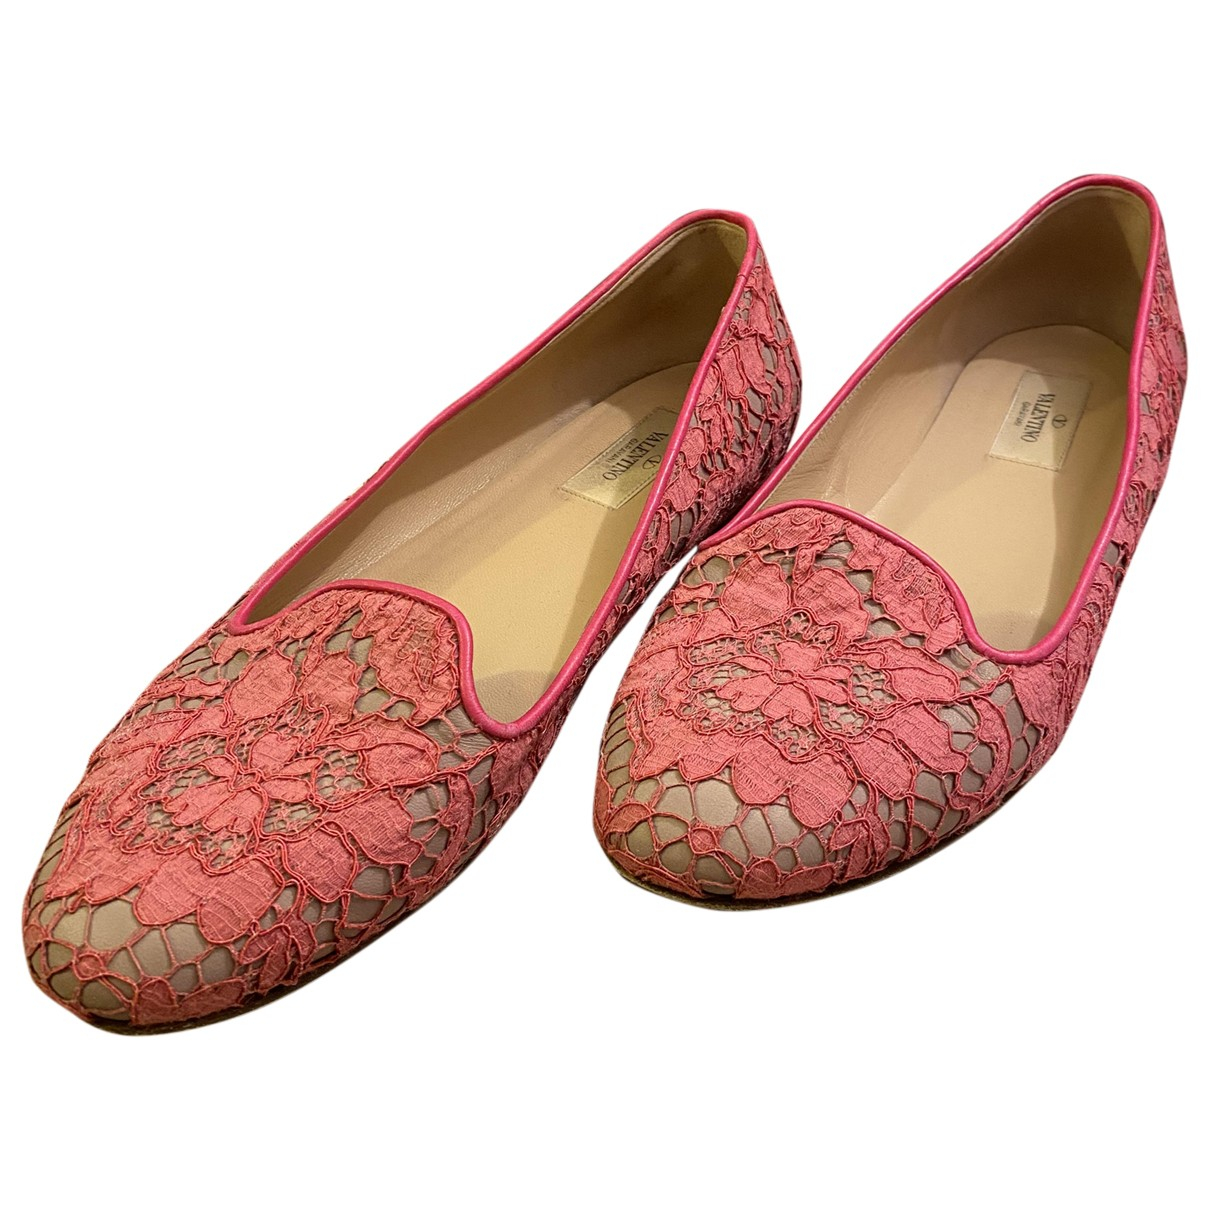 Valentino Garavani - Ballerines   pour femme en toile - rose